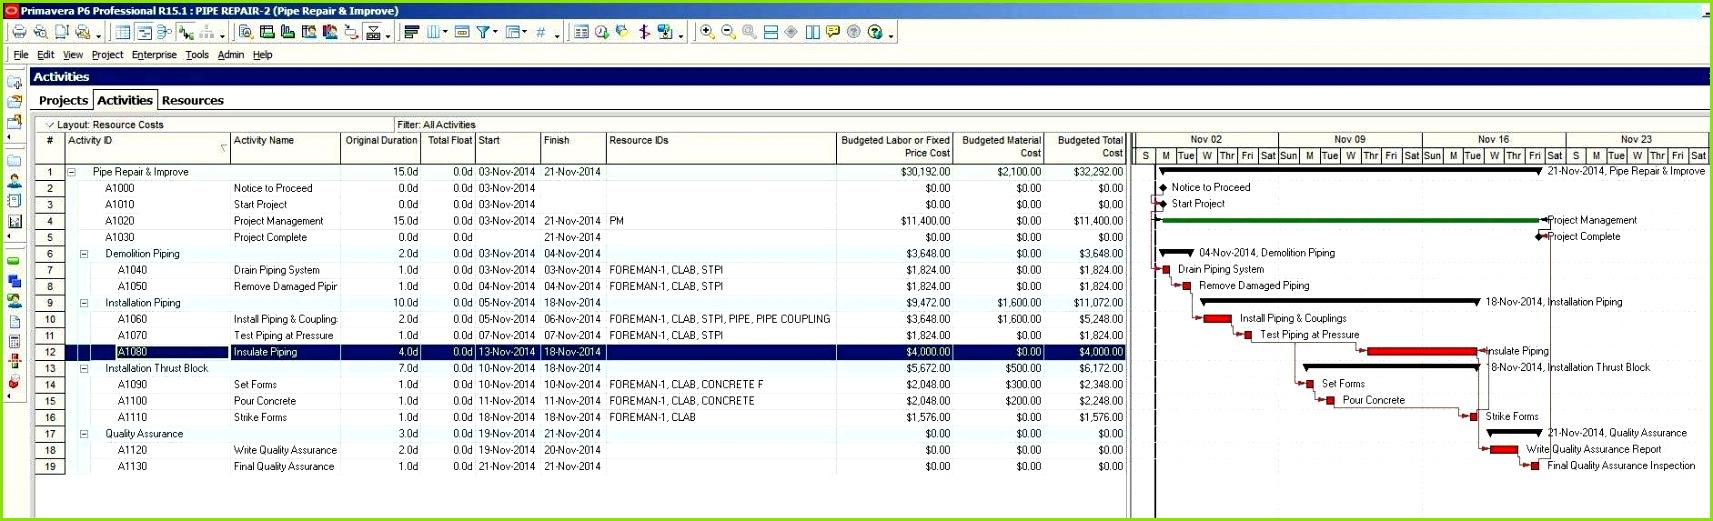 Introduction to Spreadsheets and Models Also Großartig Wartungsplan Vorlage Xls 7199